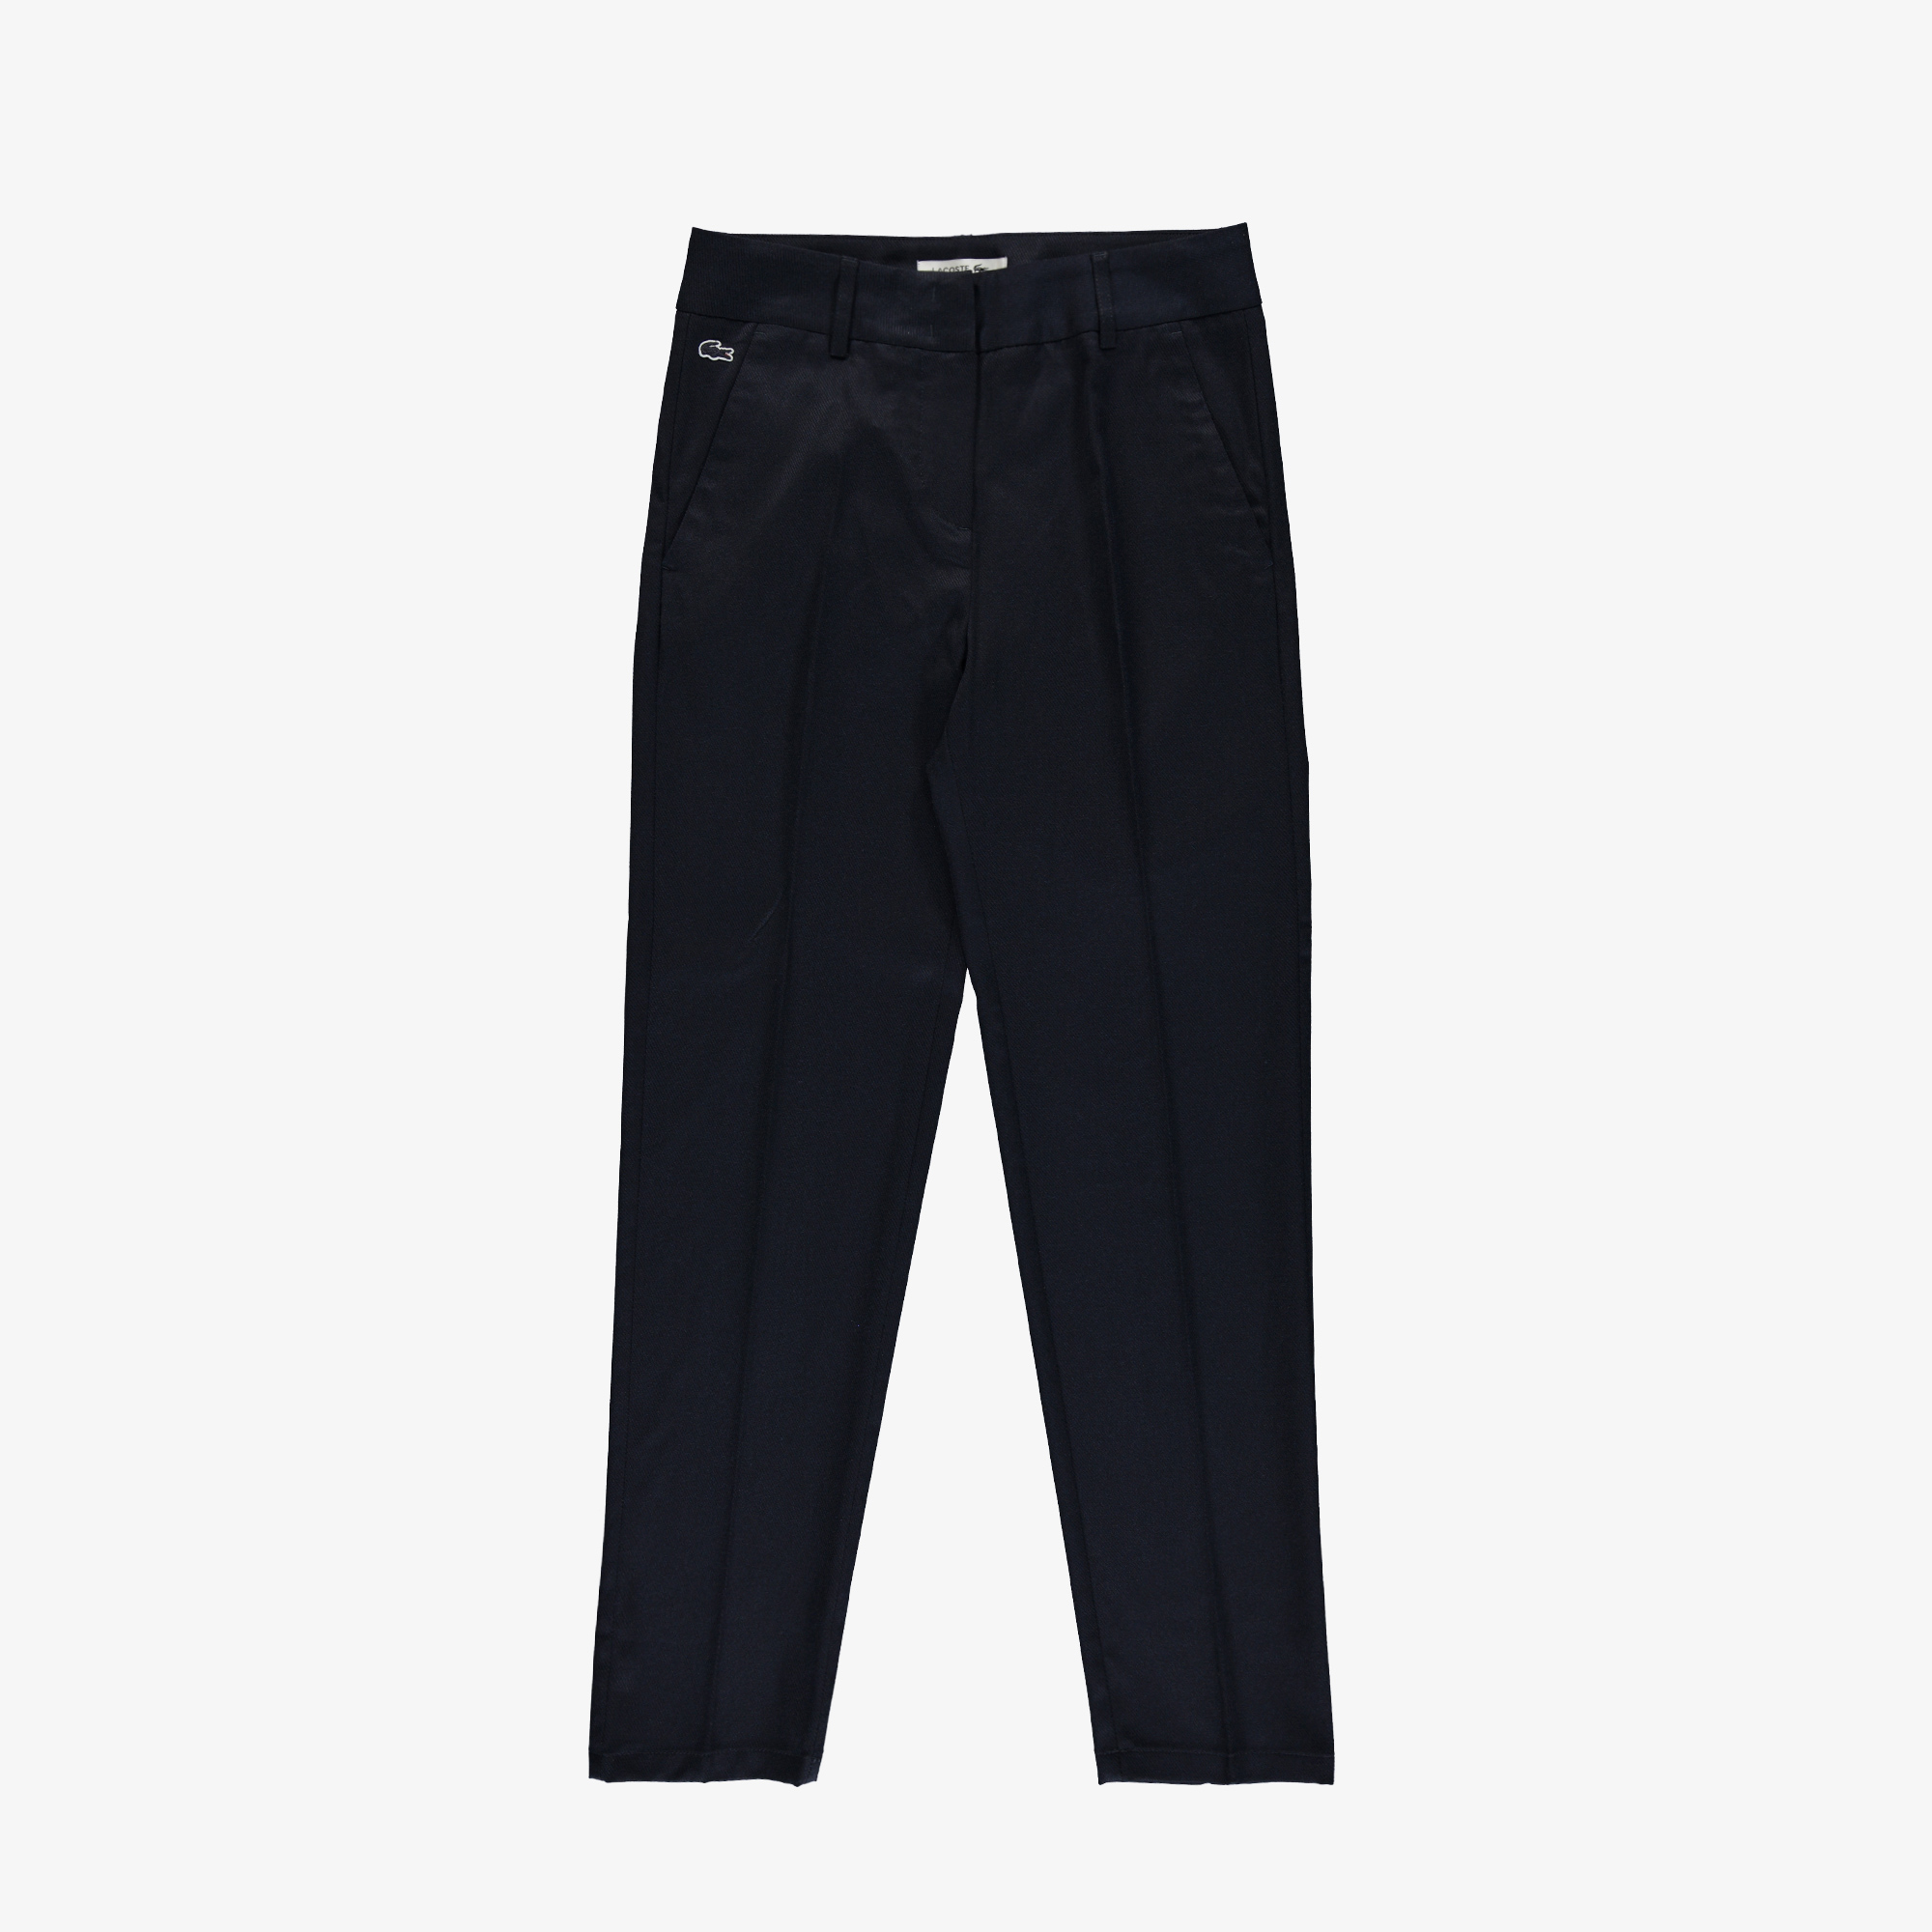 Lacoste Spodnie Damskie Proto Fit